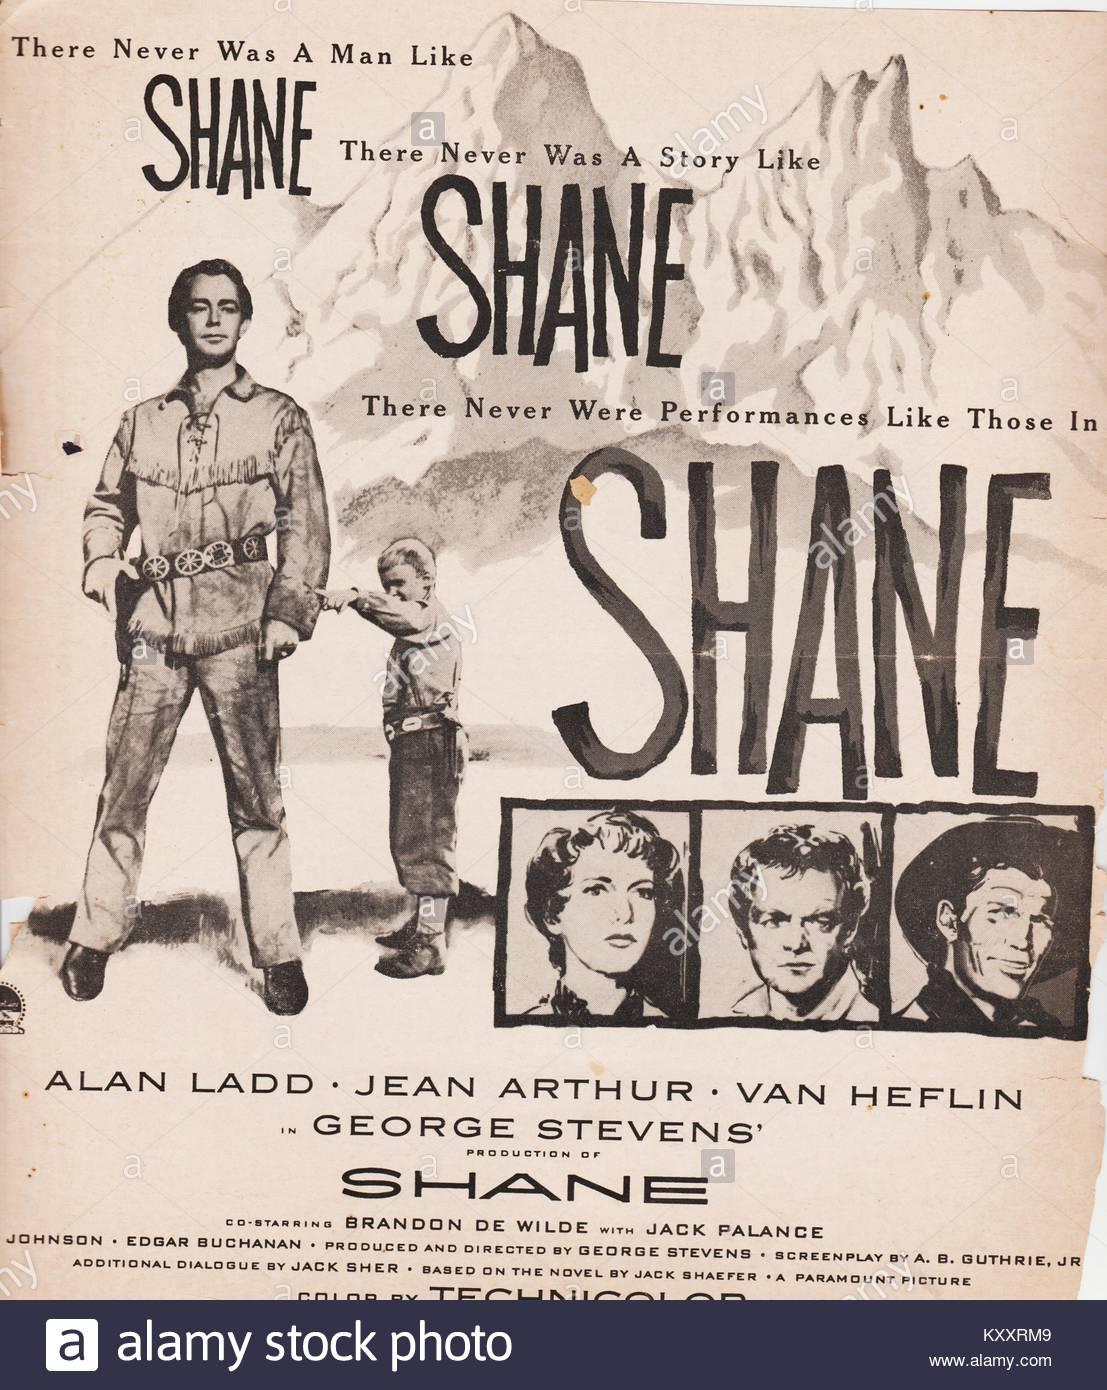 shane western novel